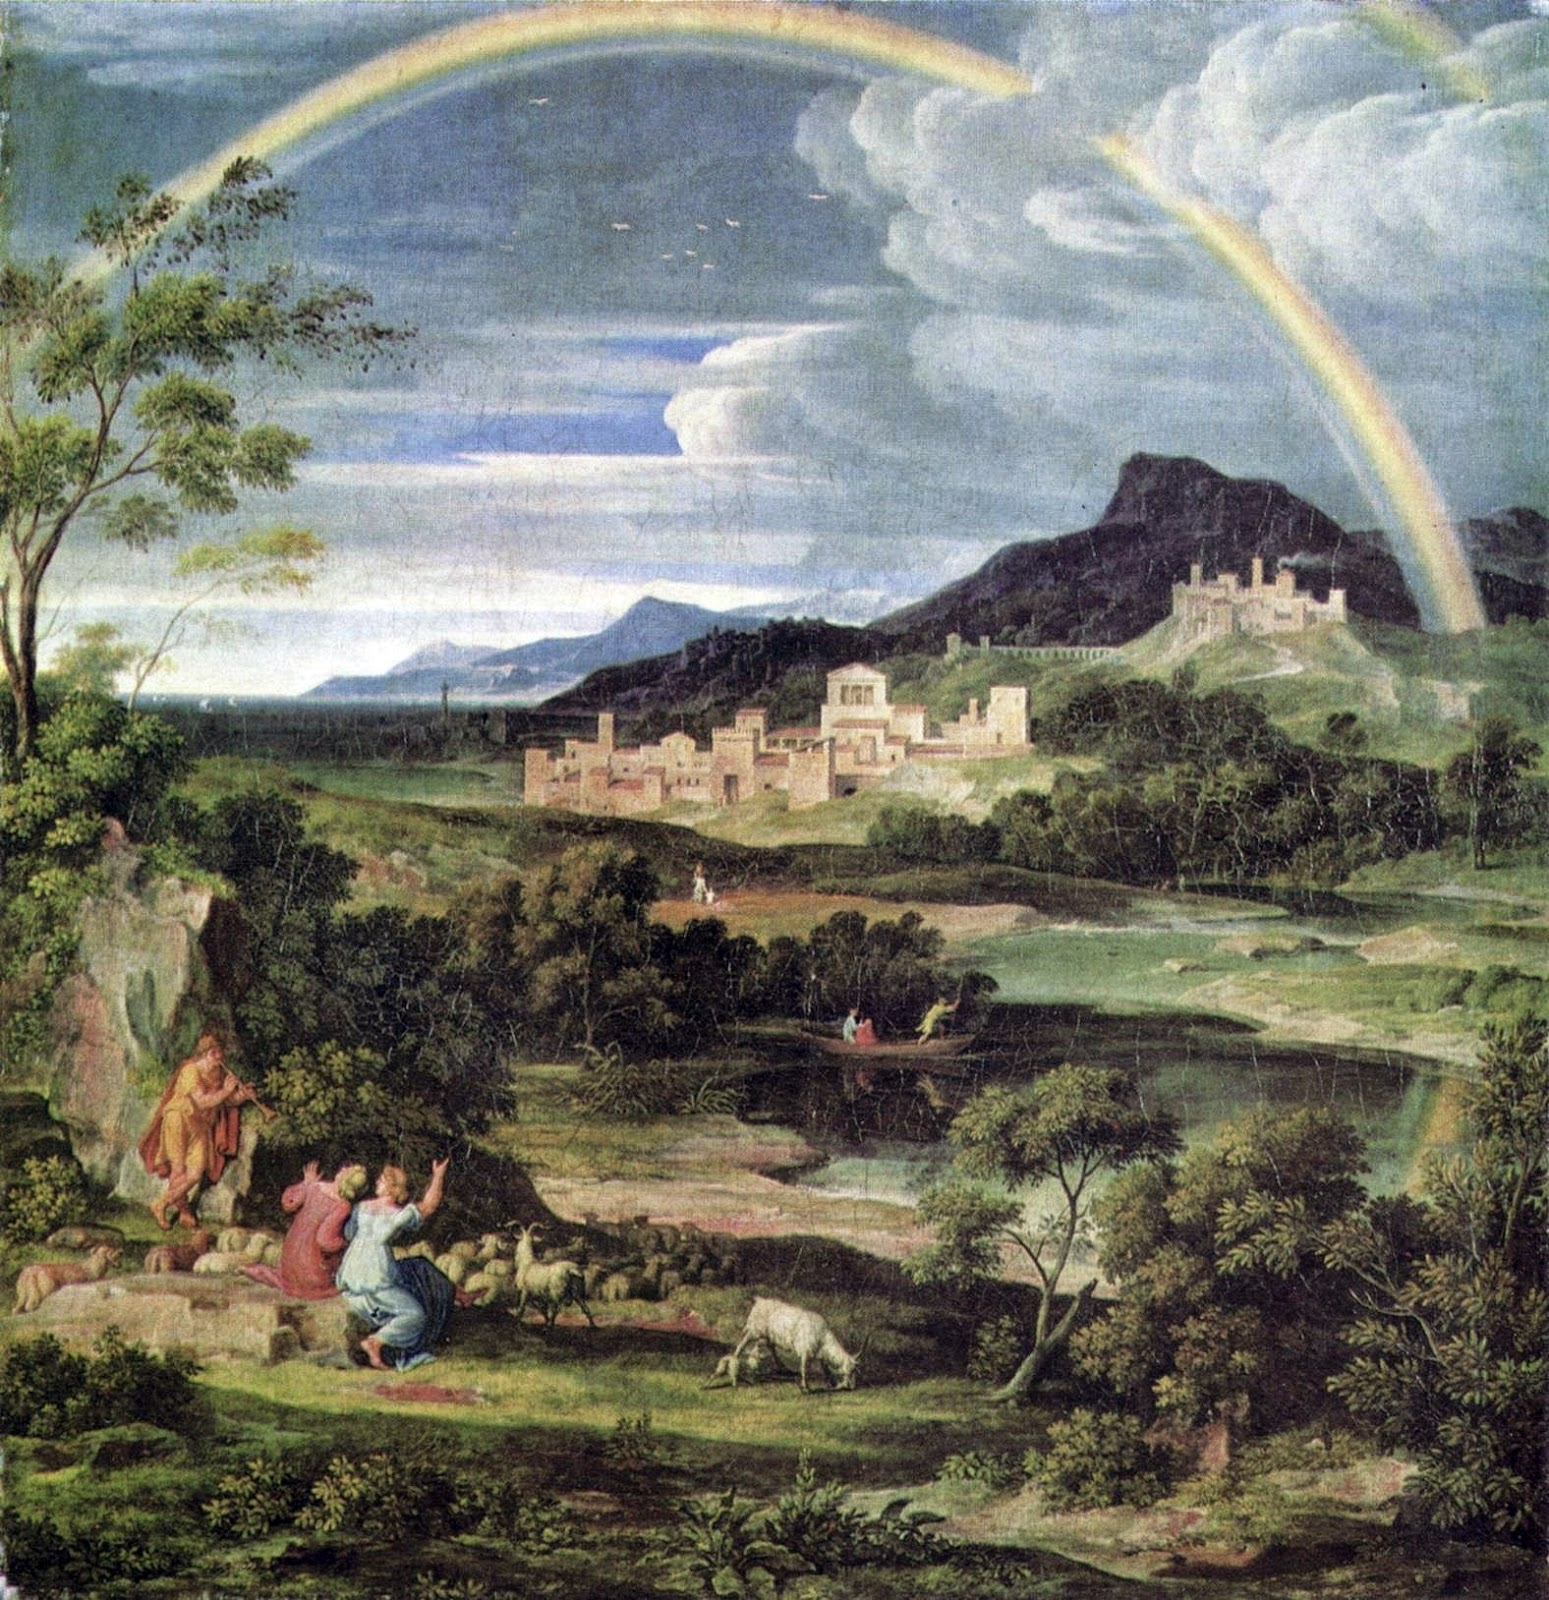 paesaggio eroico con arcobaleno